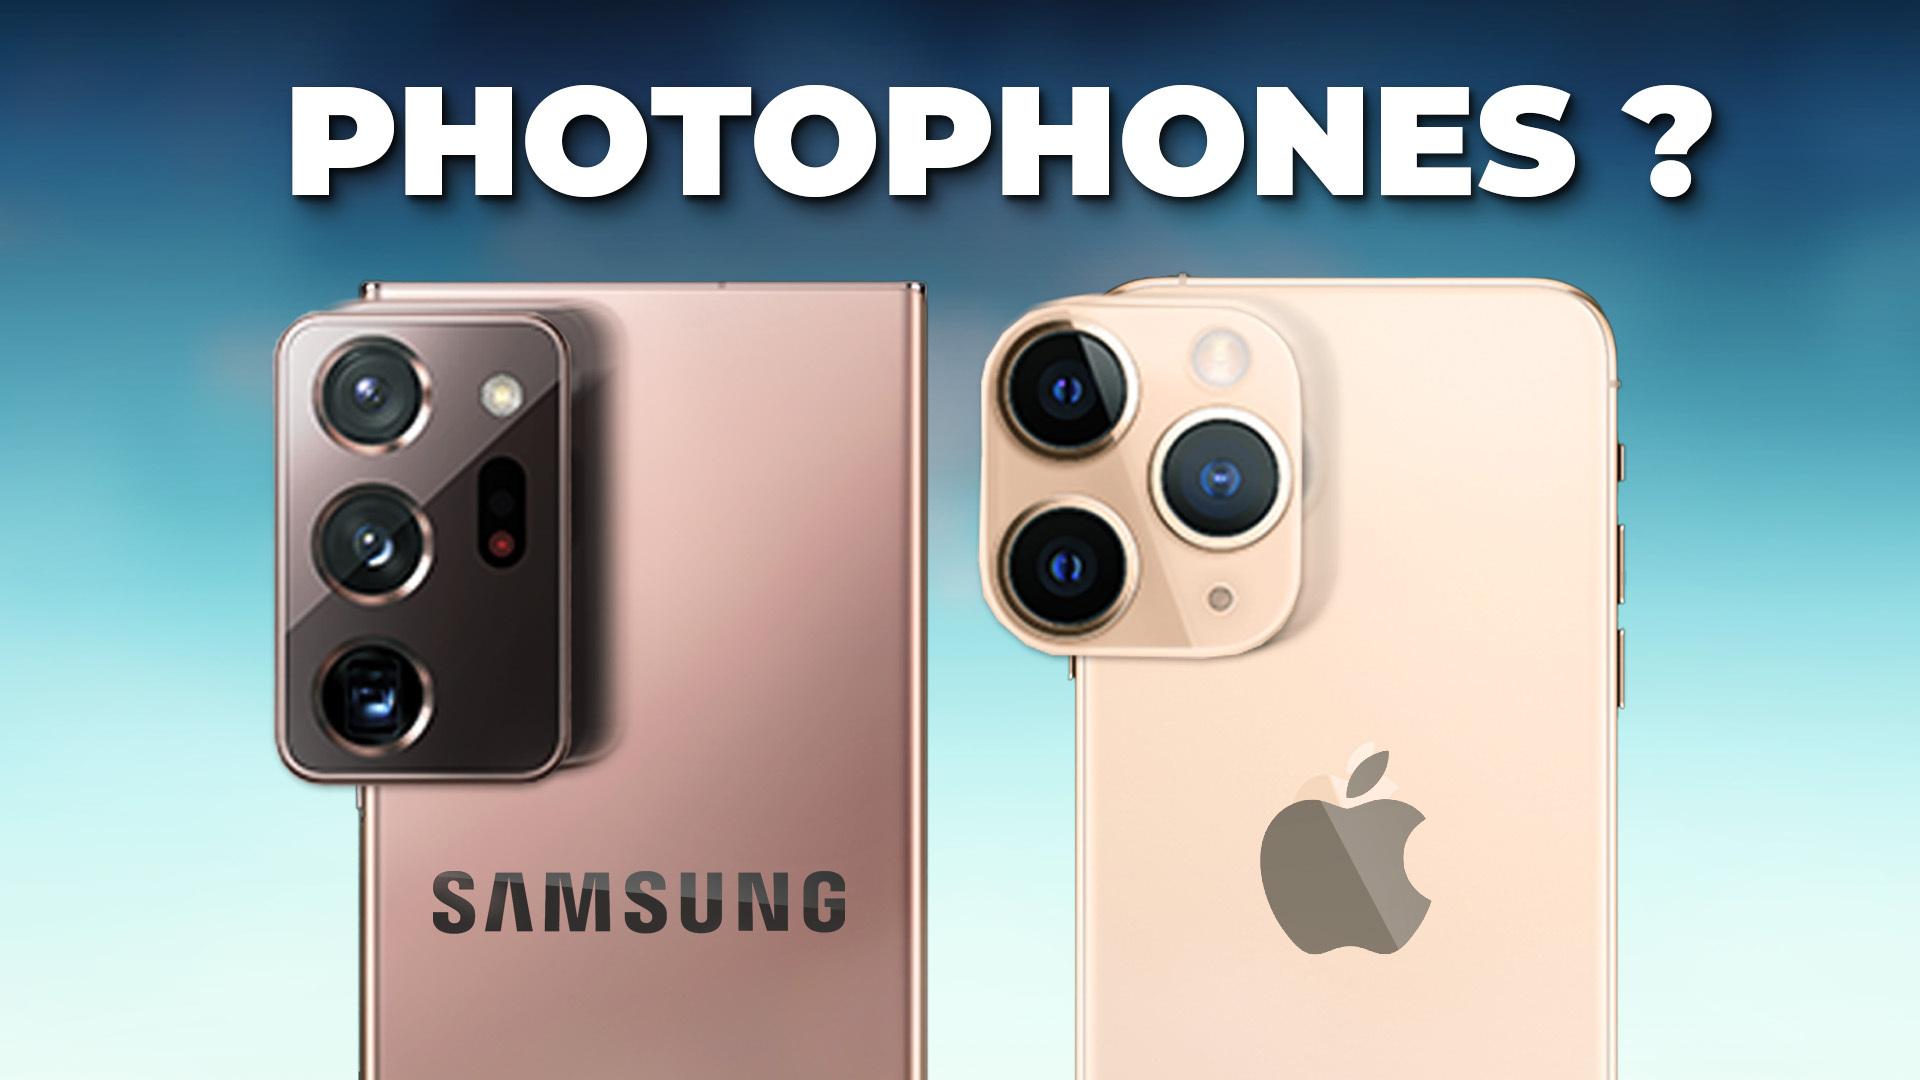 Comparatif photo : Galaxy Note 20 Ultra VS iPhone 11 Pro